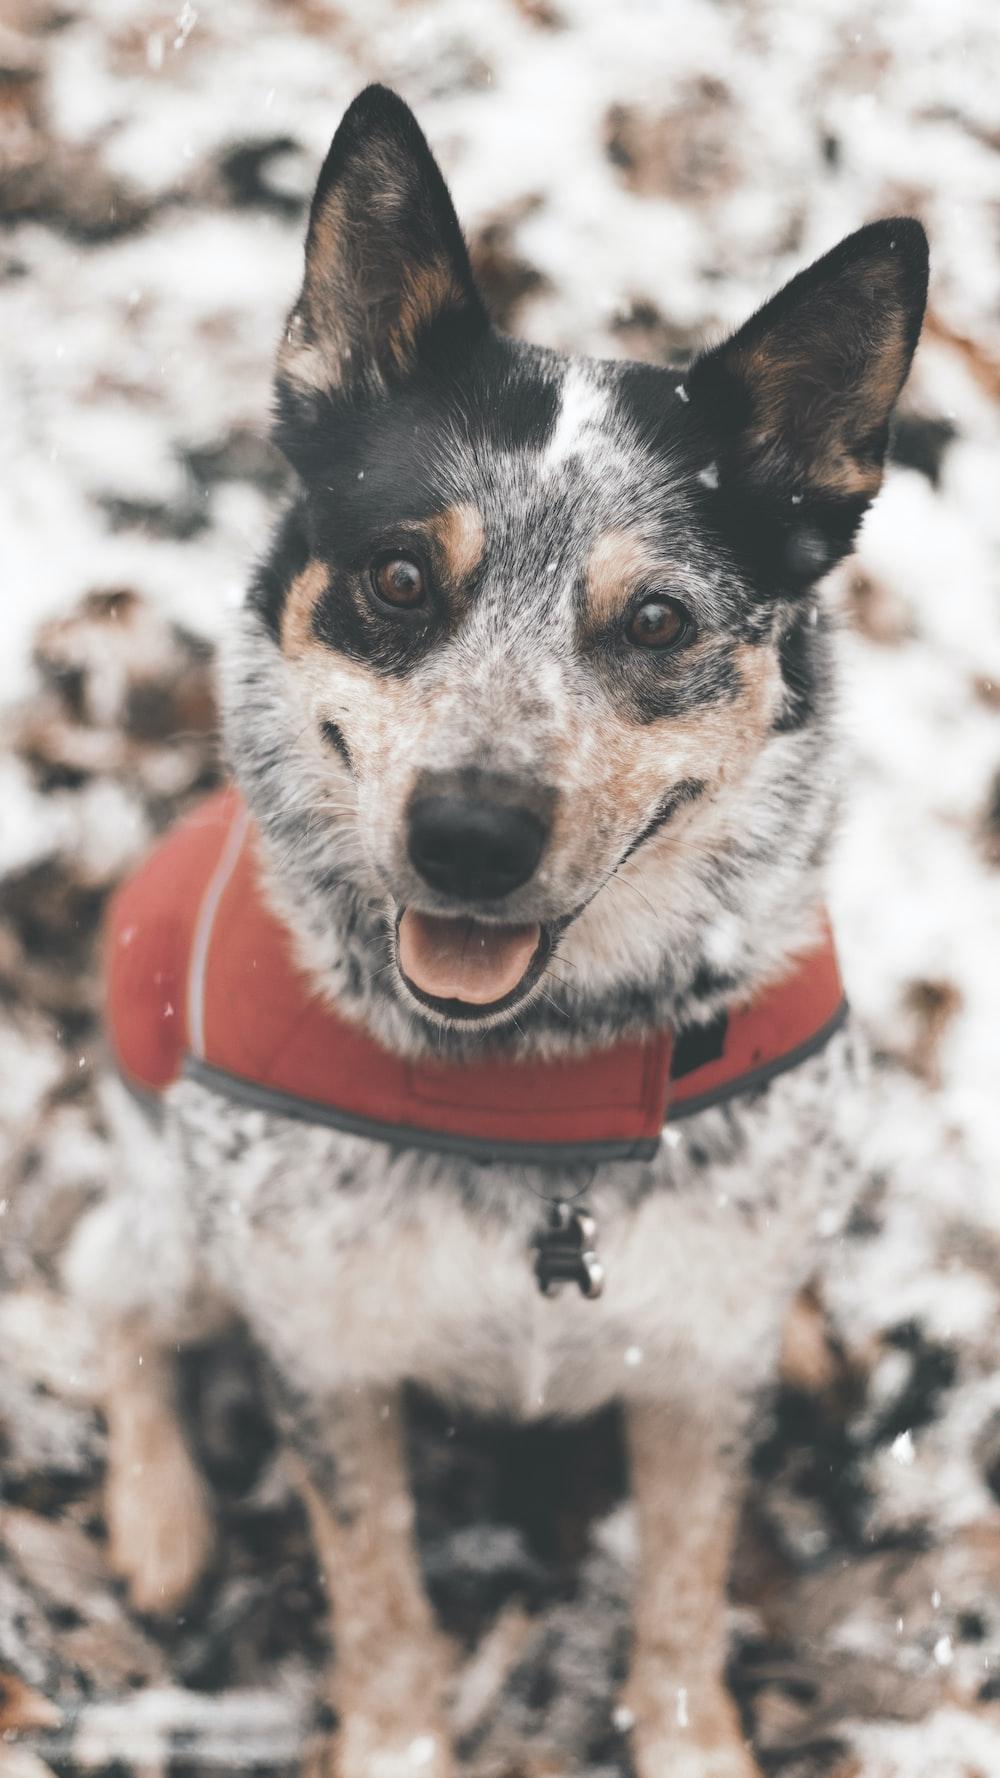 white and black short coated small dog